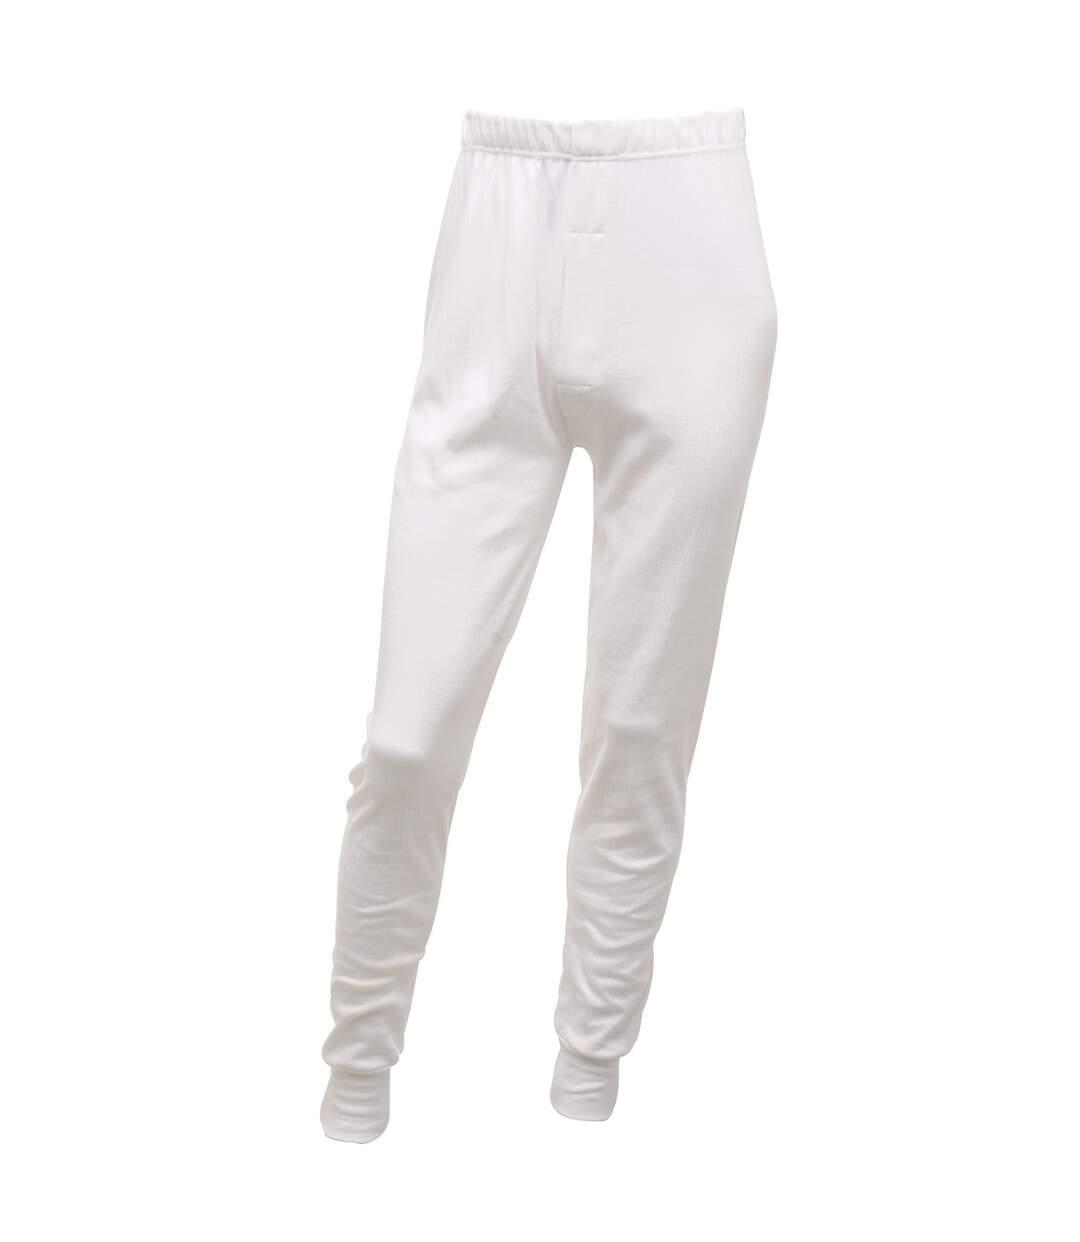 Regatta Mens Thermal Underwear Long Johns (Denim) - UTRW1260